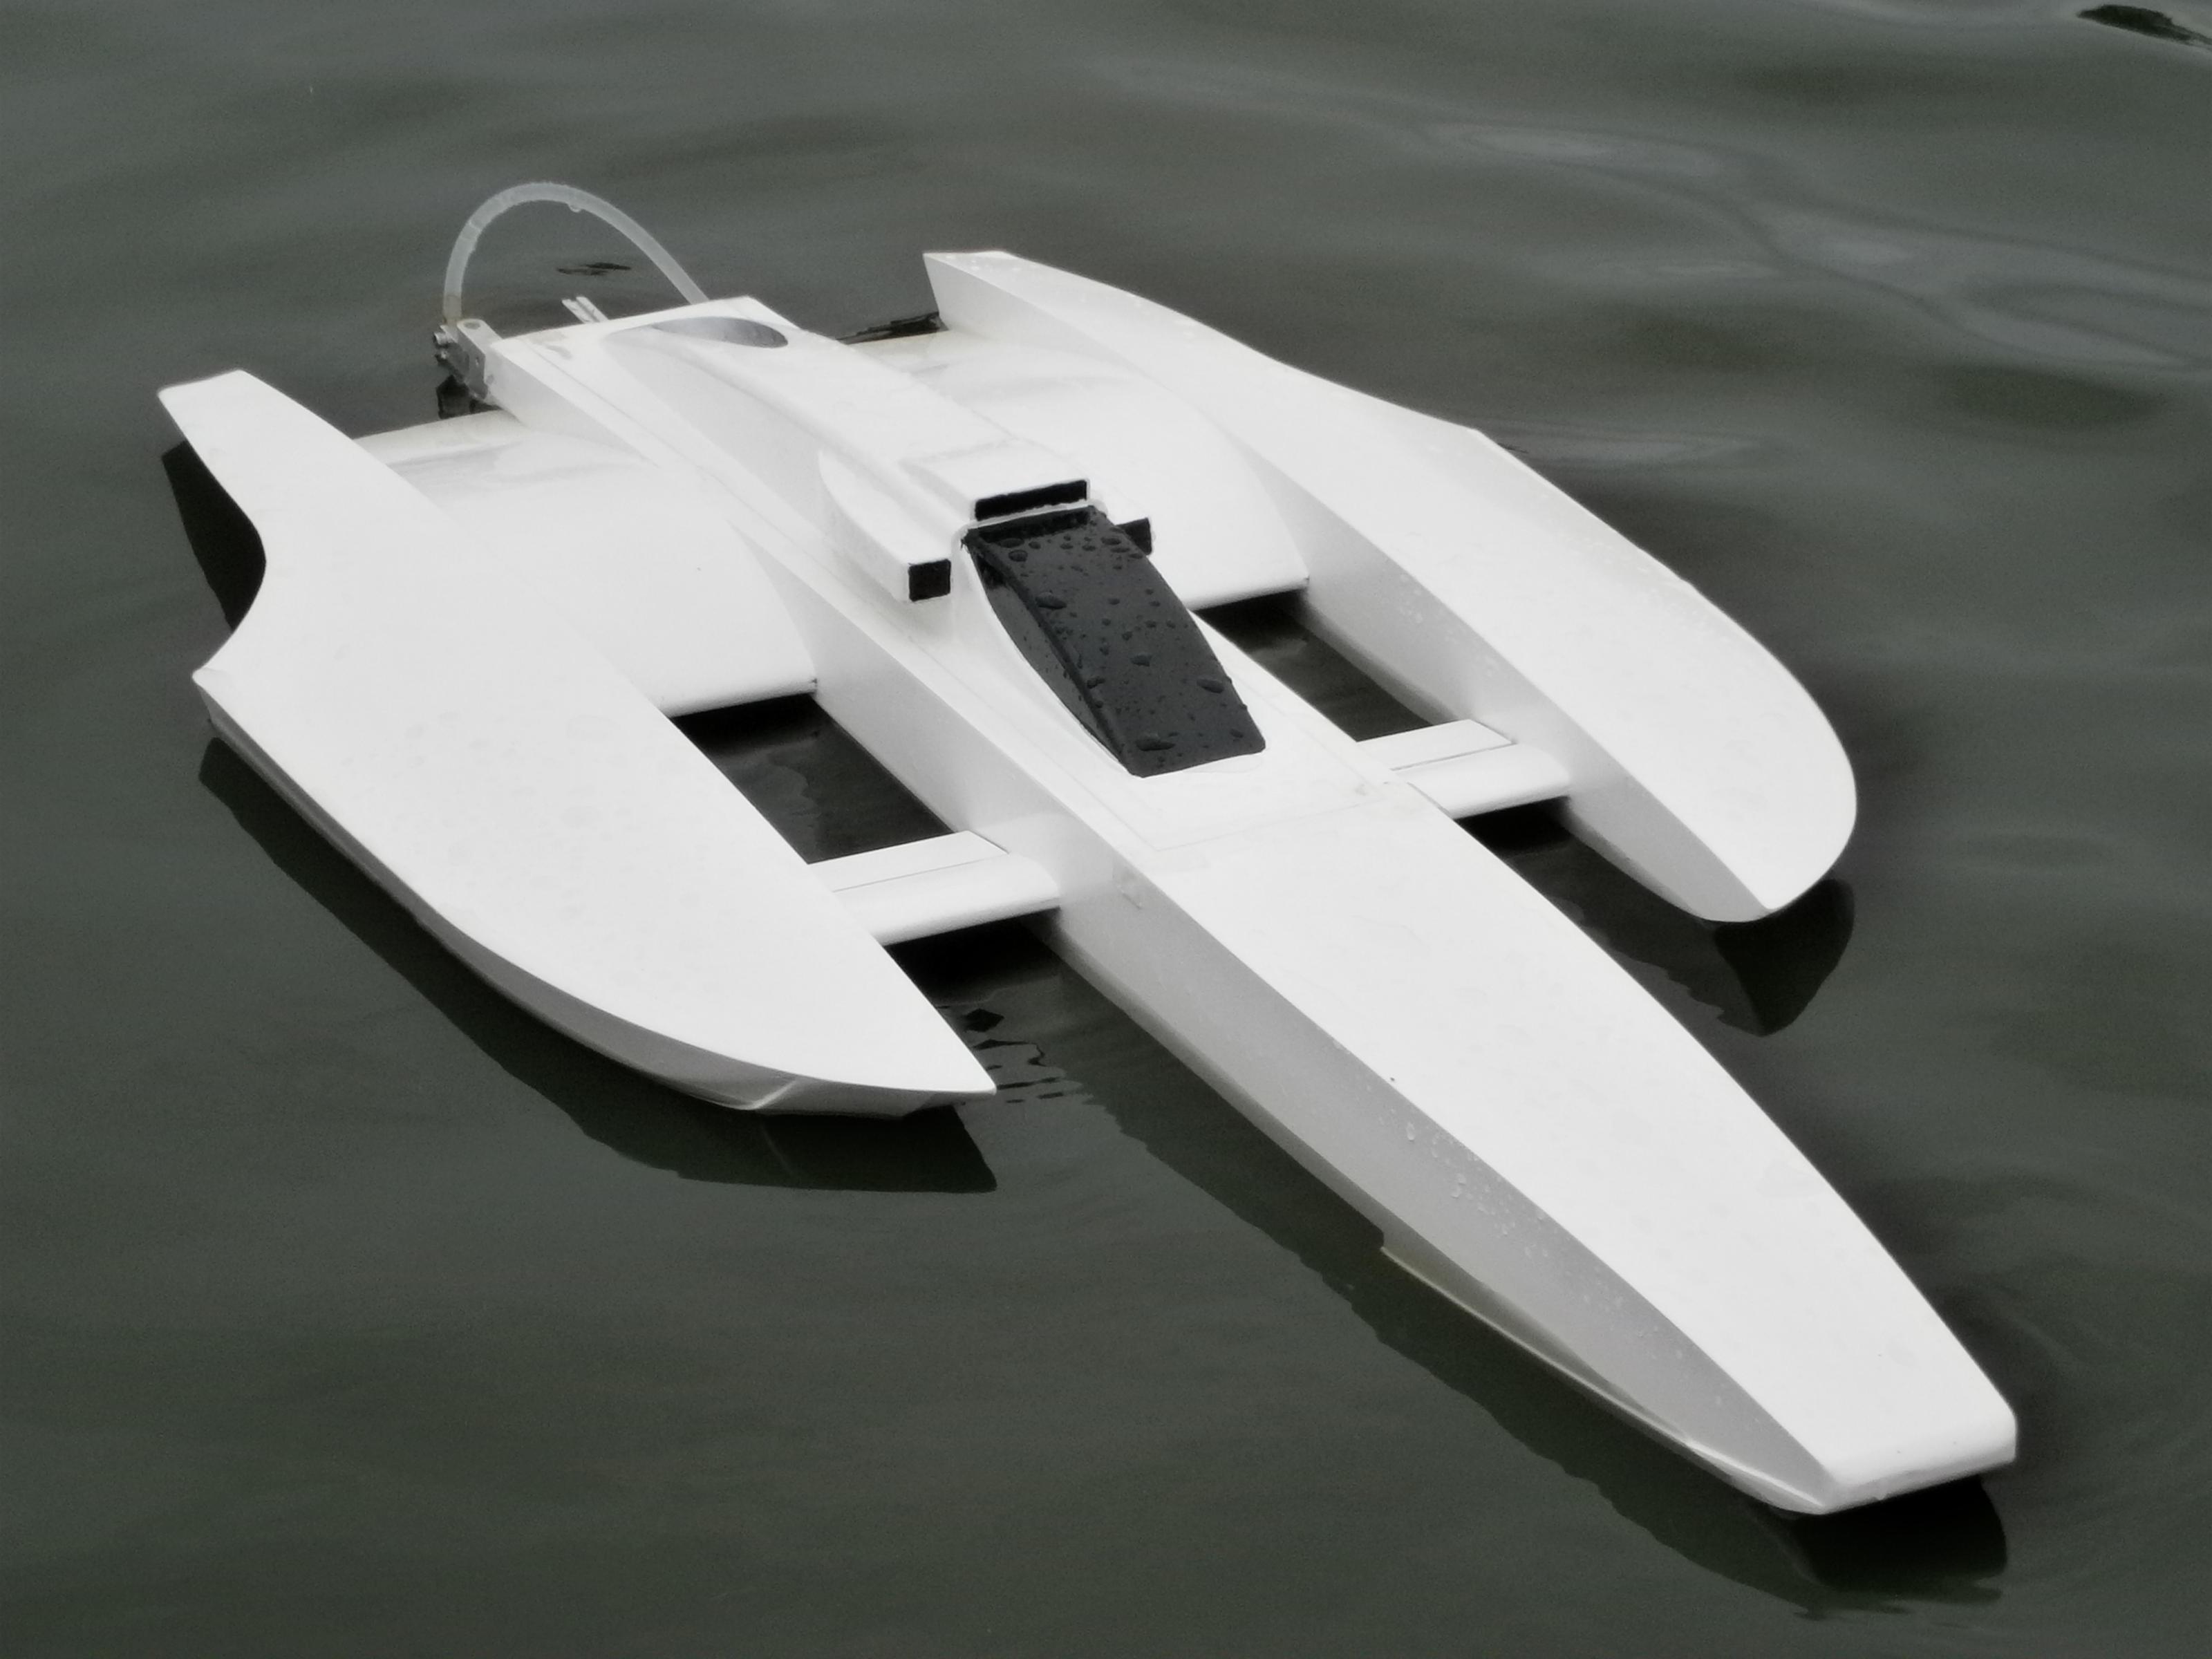 Name: 005.jpg Views: 32 Size: 328.9 KB Description: Sea Eagle Canard. ML Boatworks kit converted to a Canard configuration. HET  700-83 1080kv motor, Seaking 130A HV  esc, 8s lipo, X450/3 blade prop.